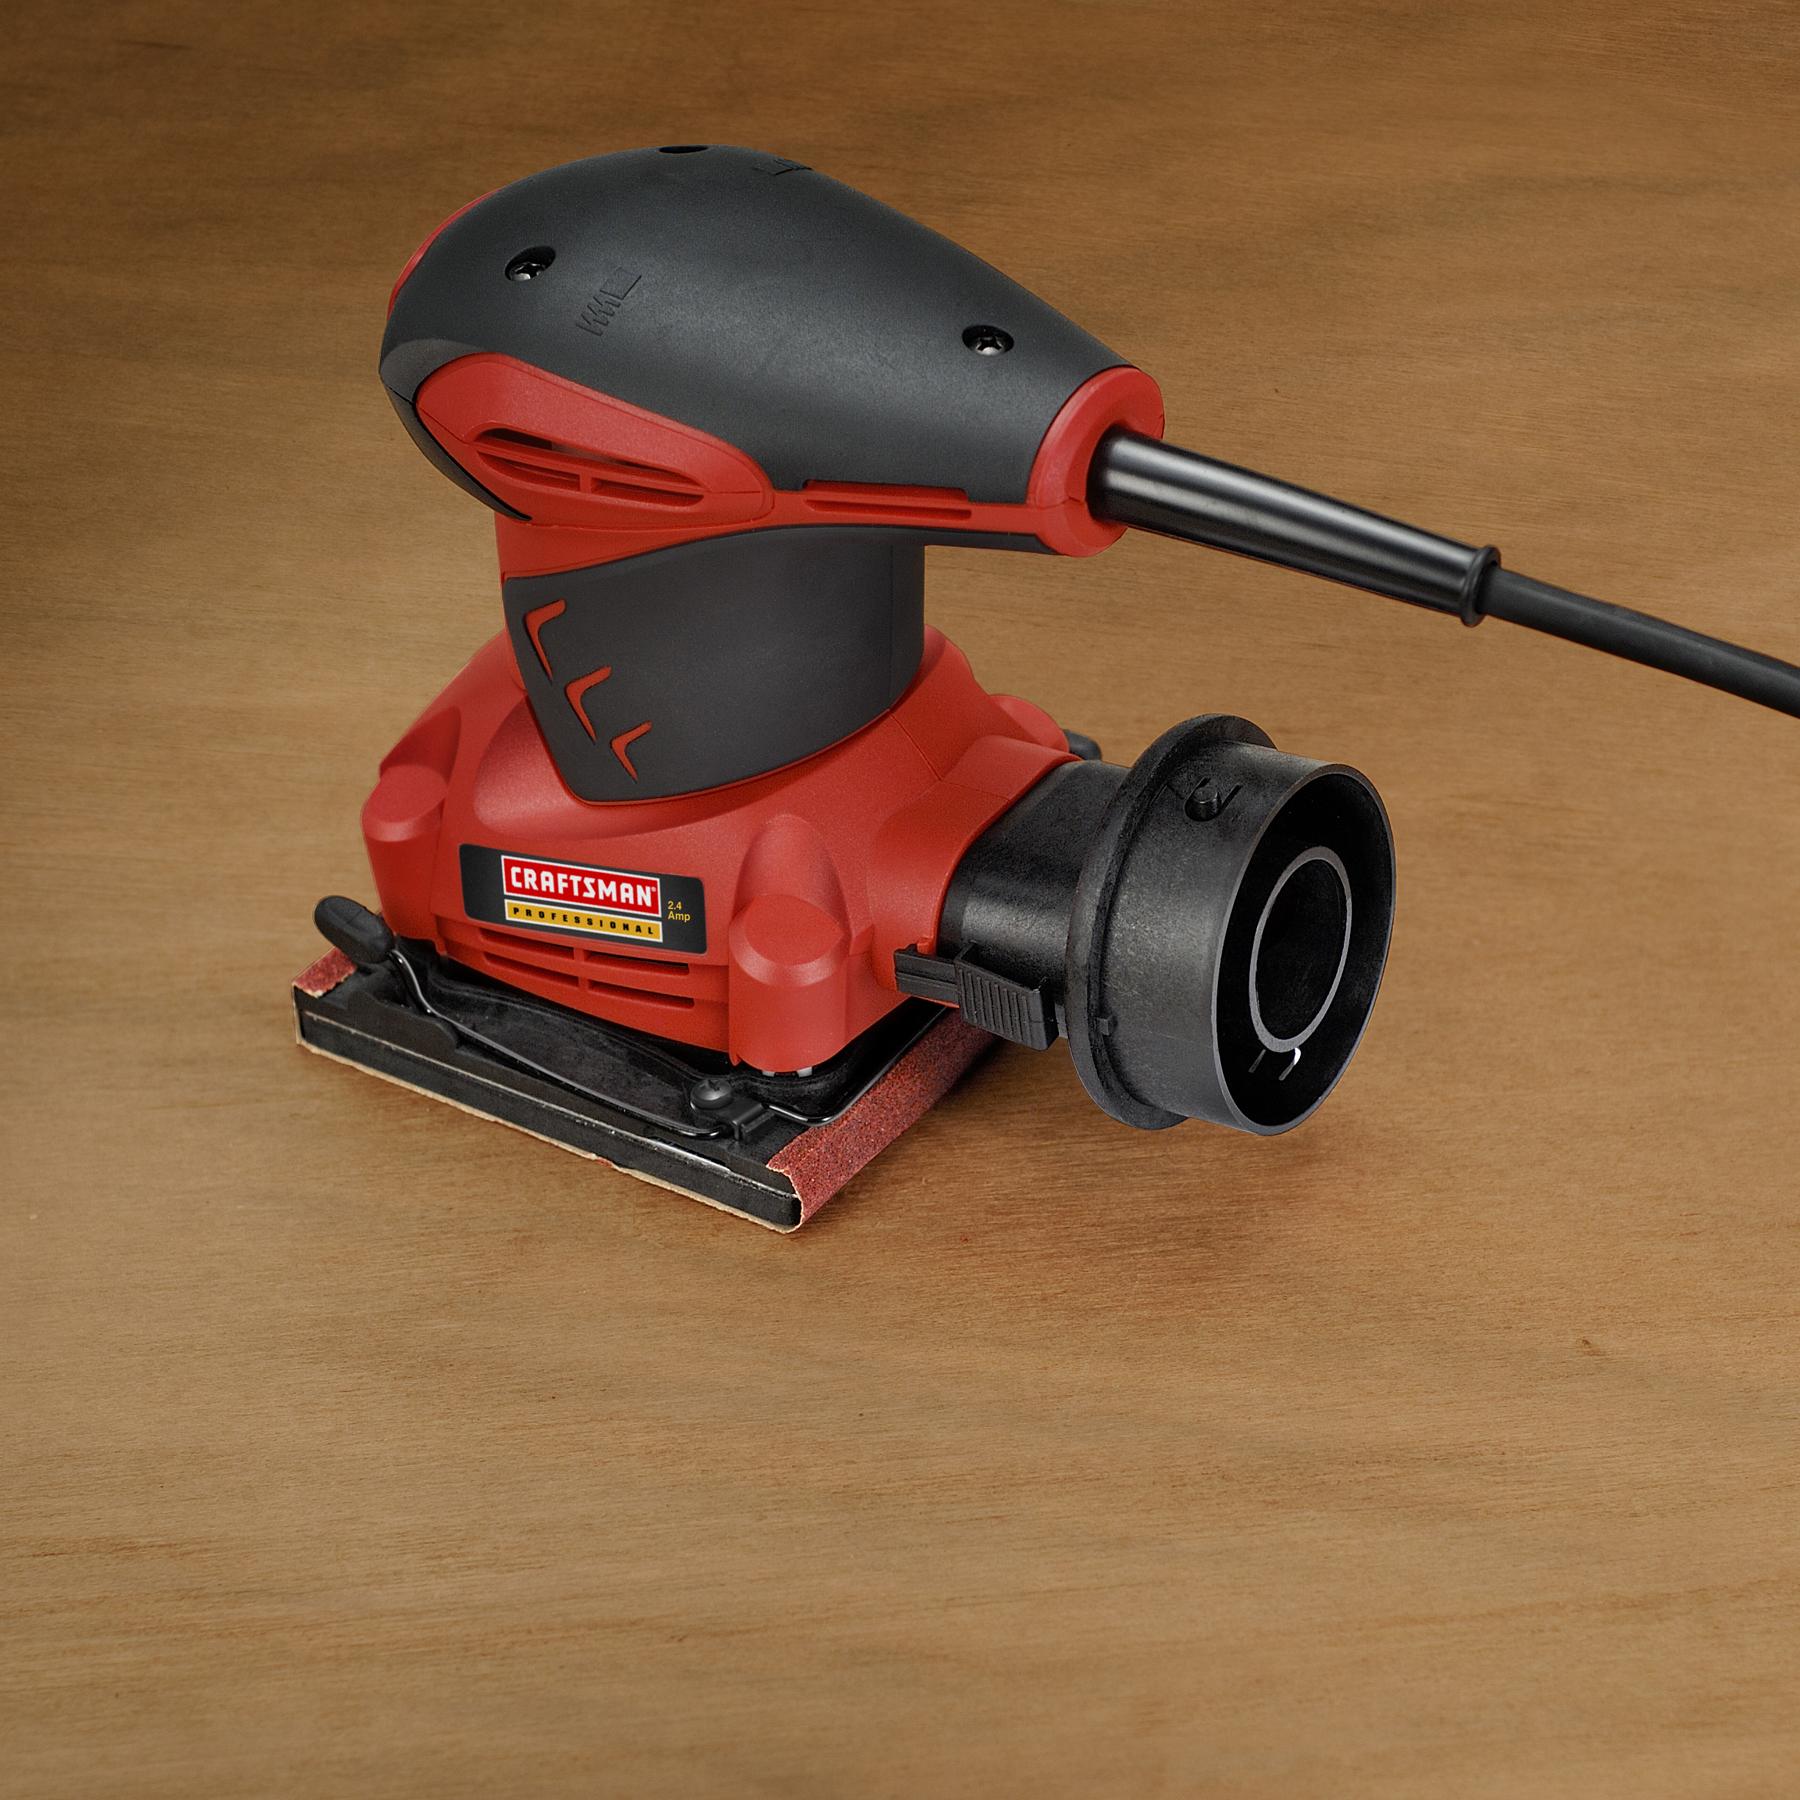 "Craftsman Professional 27670 2.4 amp Corded 1/4"" Pad Sander"